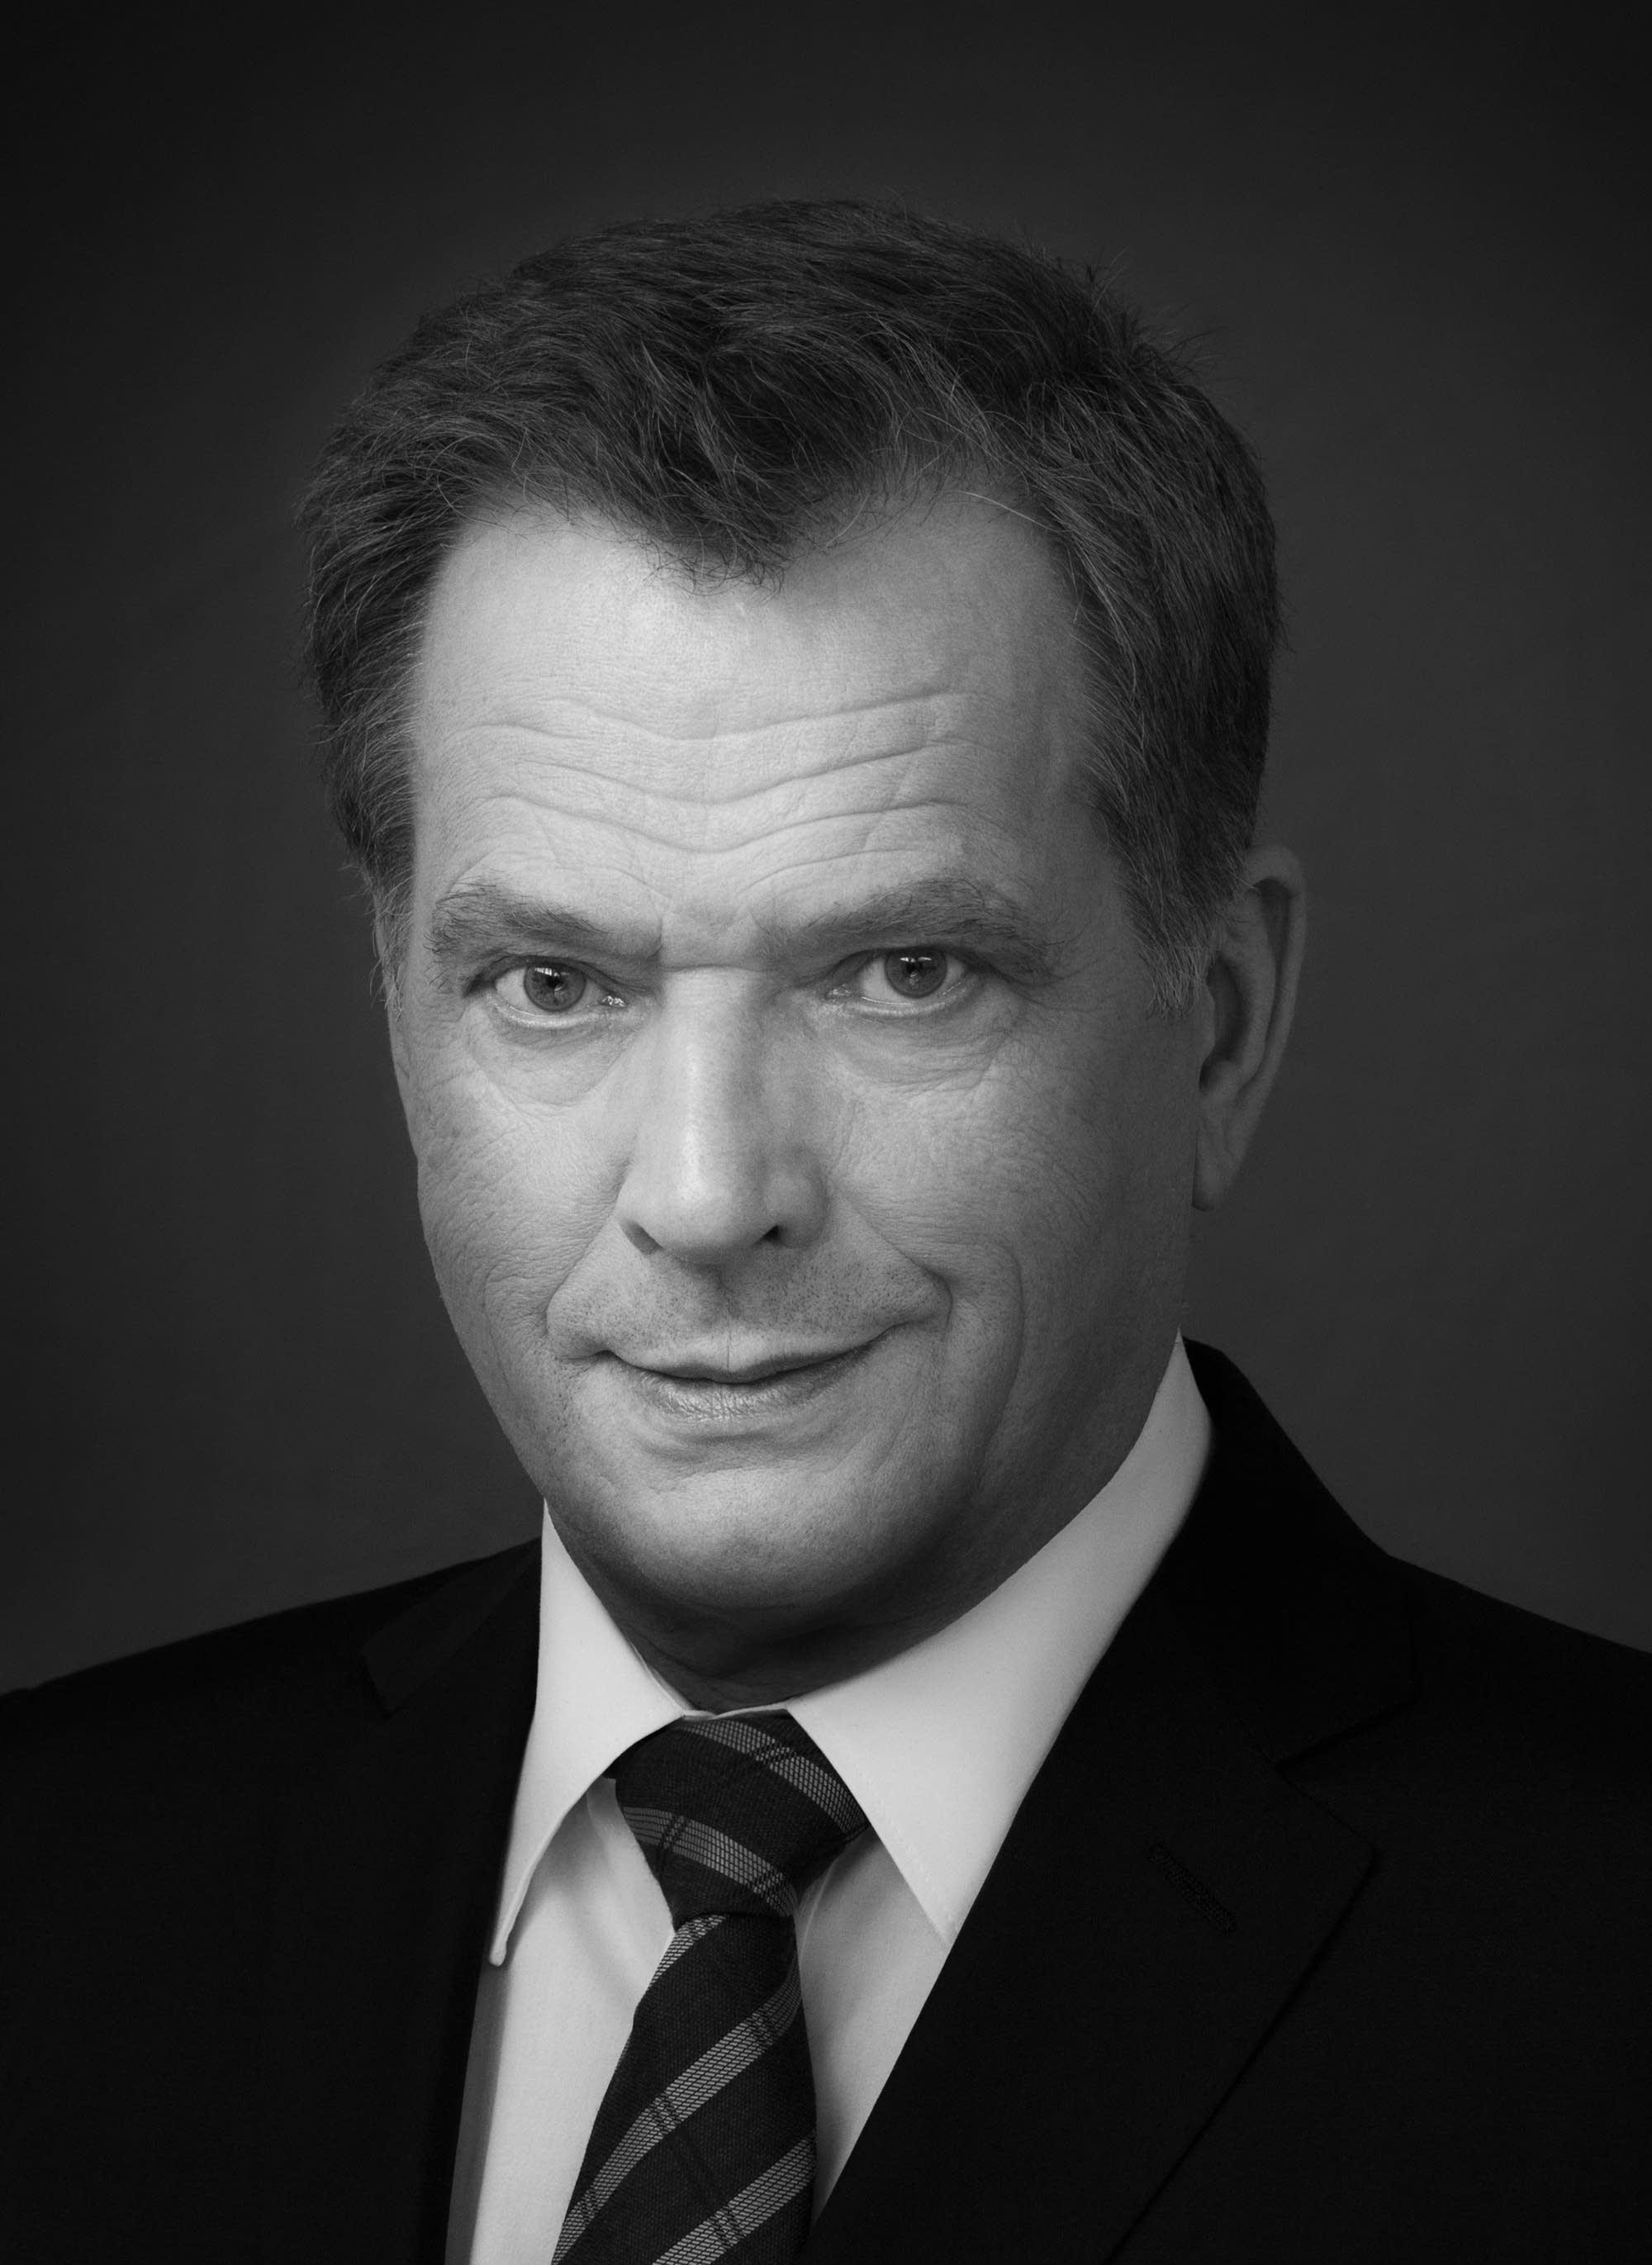 Finland President Sauli Niinisto